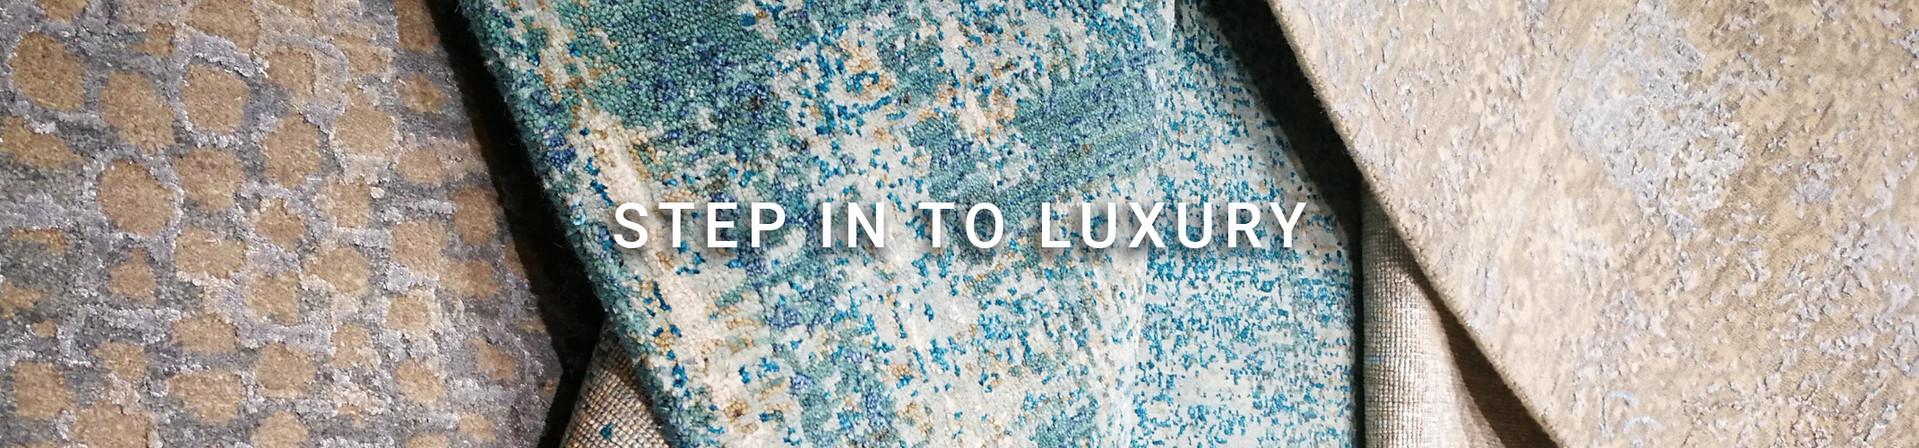 Wix Banner3.jpg